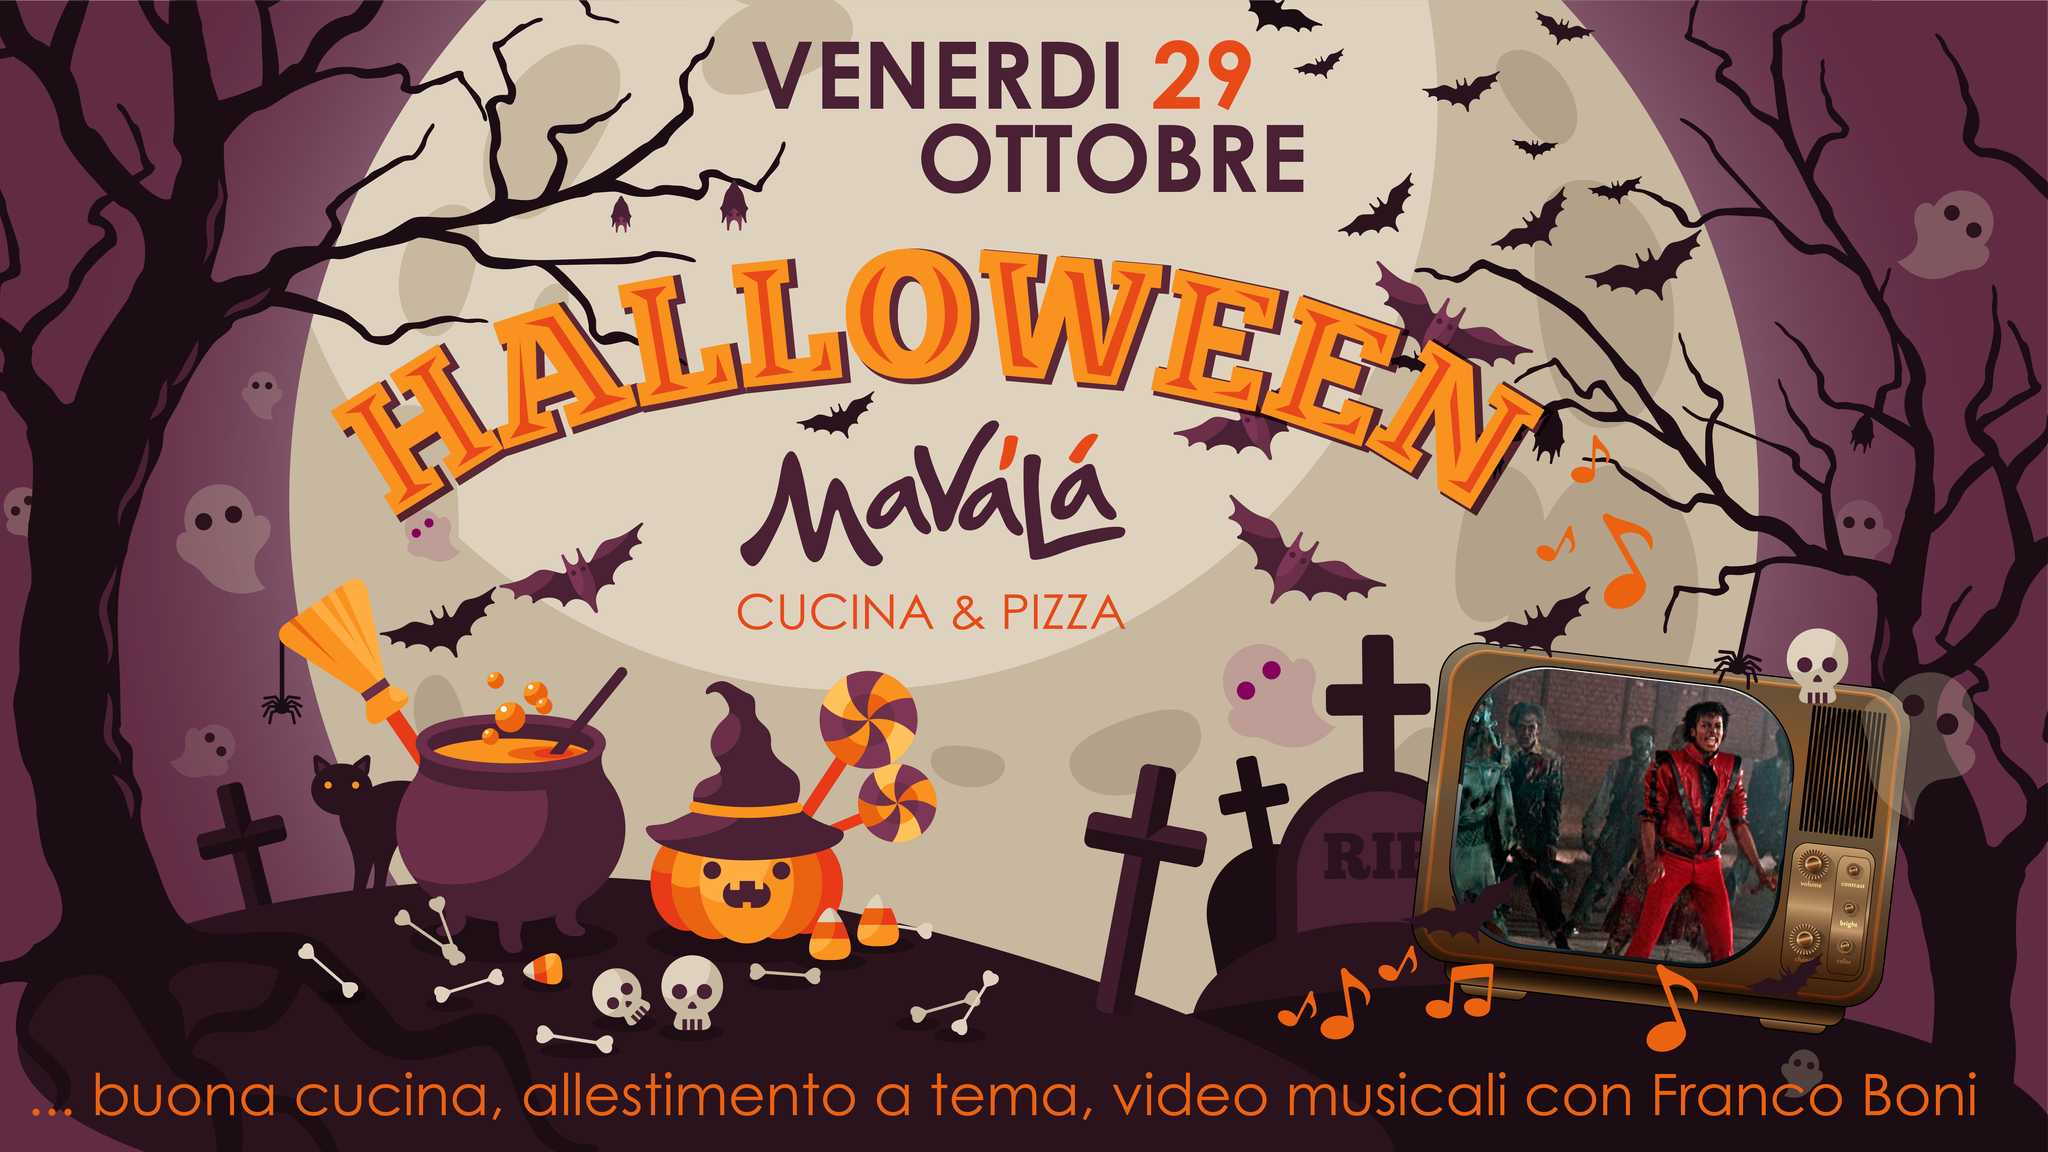 MAVALA_LOCANDINE_OTTOBRE_31_HALLOWEEN-04_____1